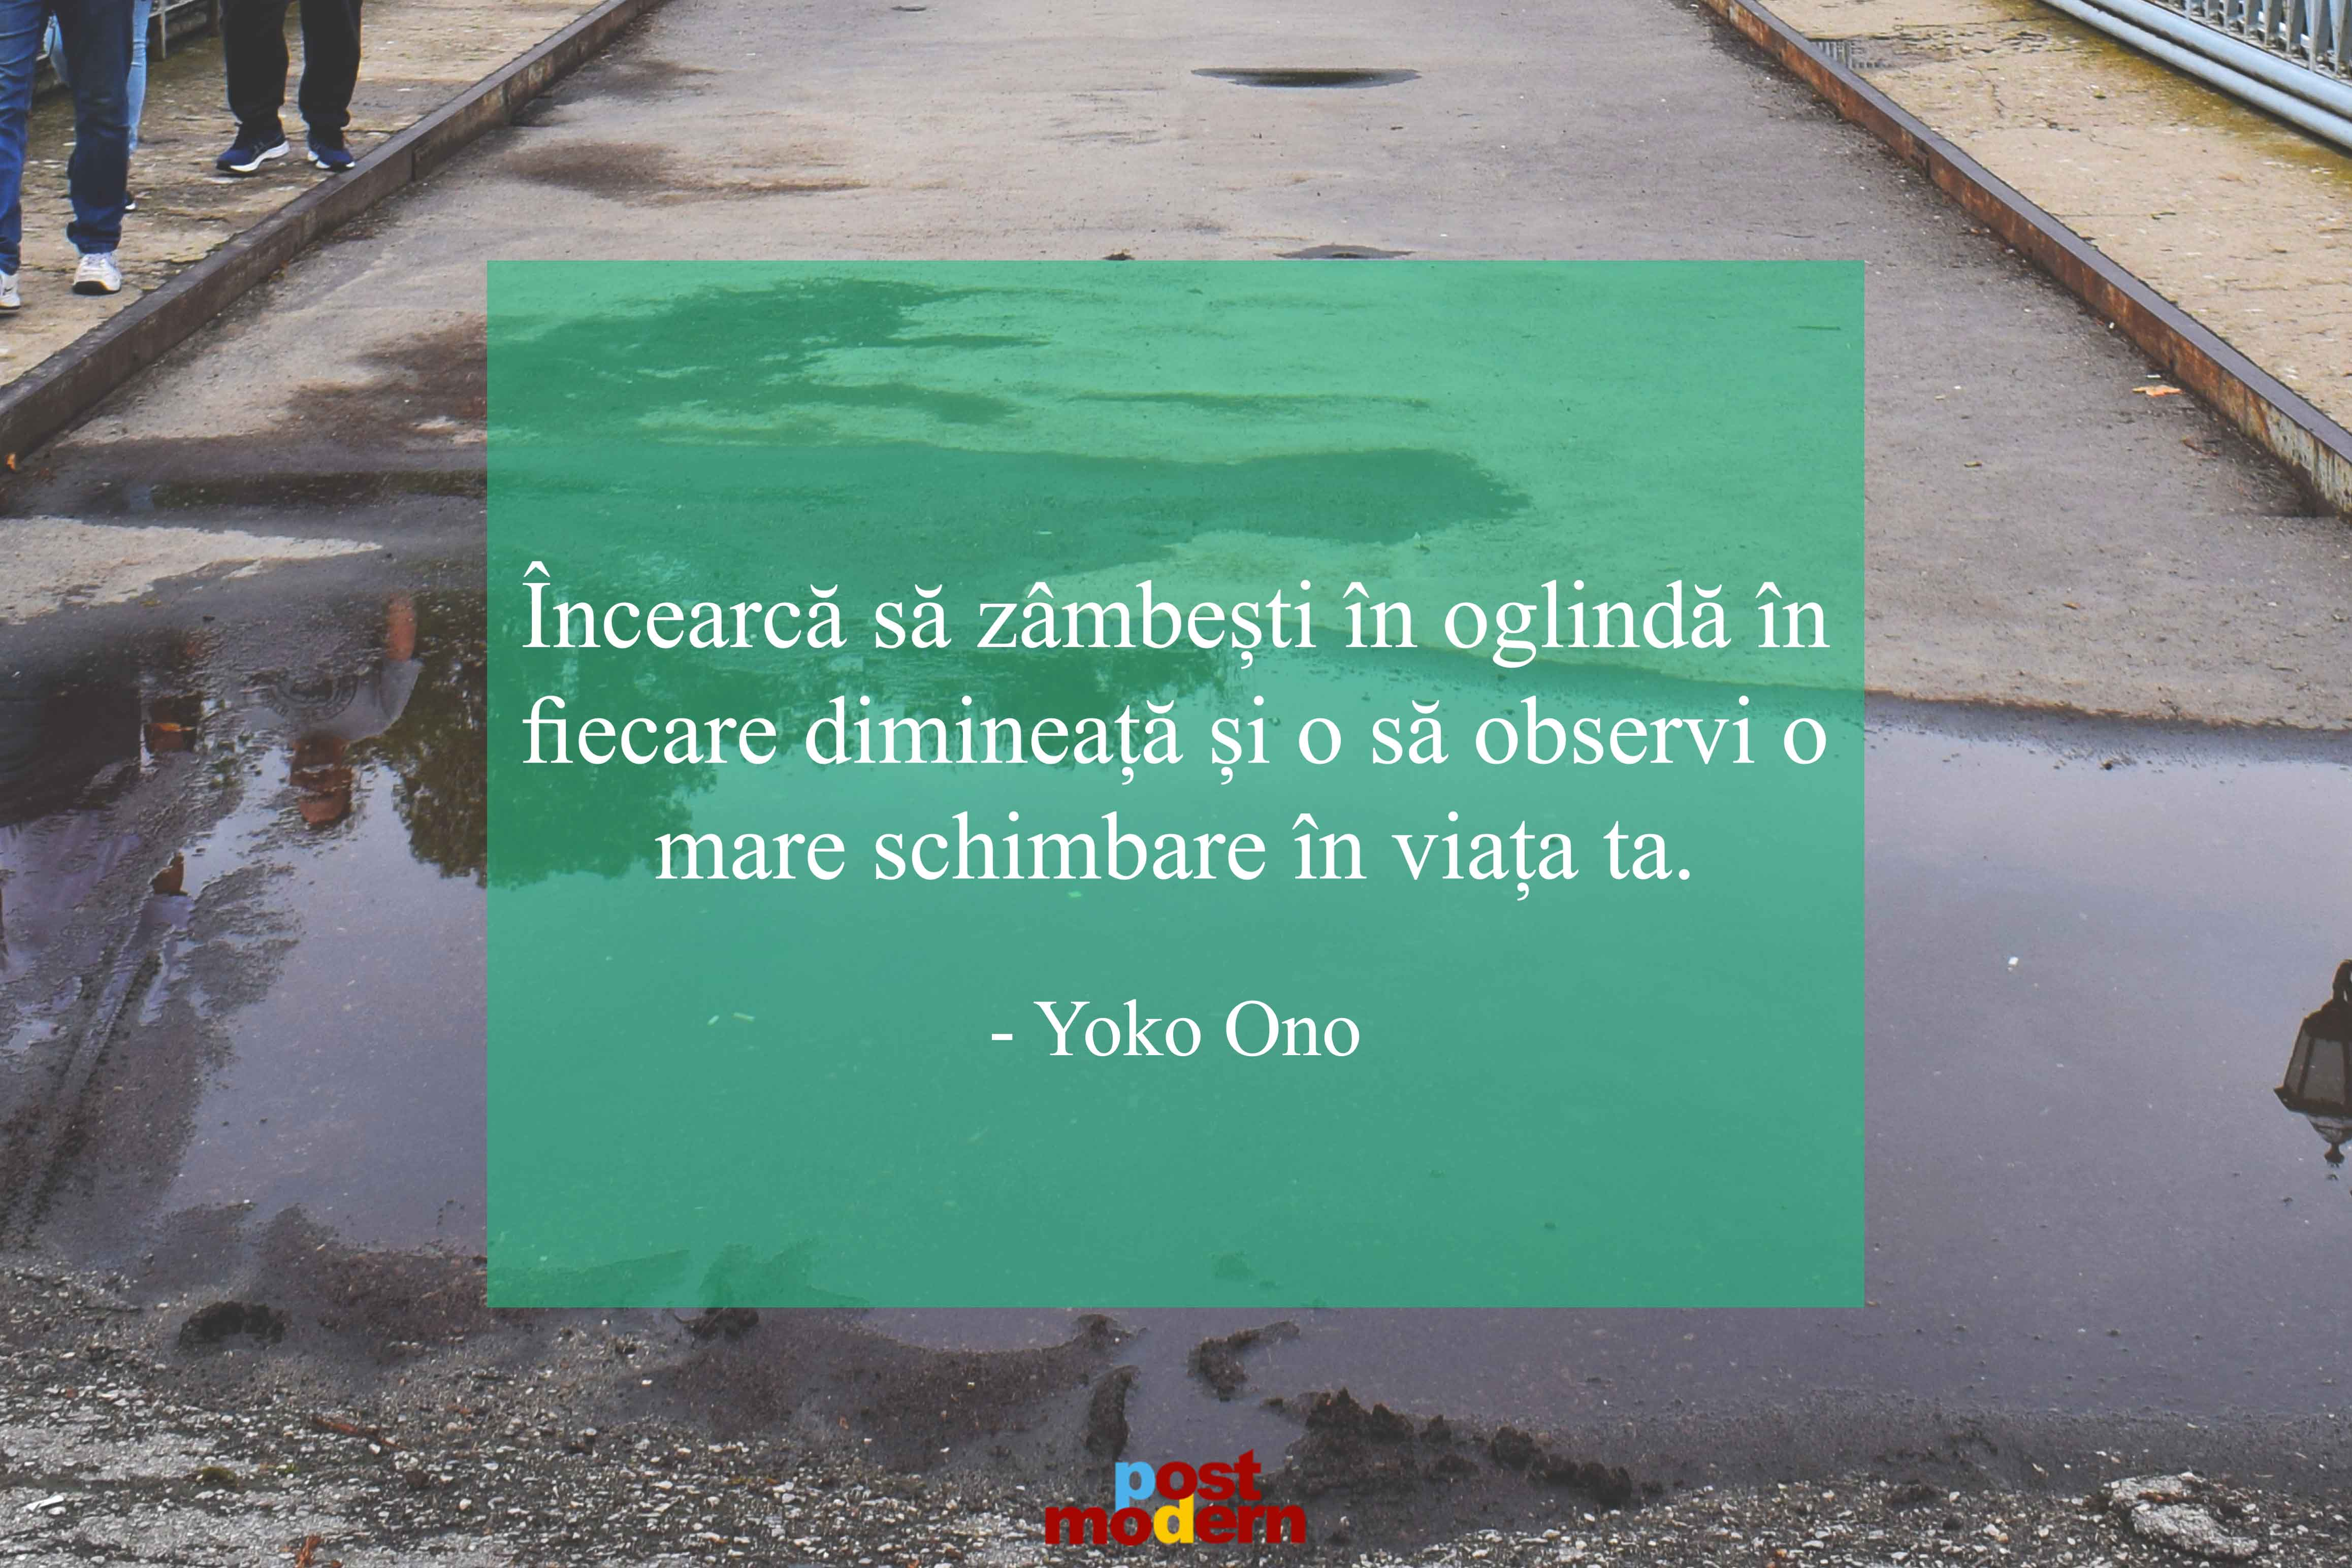 Yoko Ono - citat despre zambire